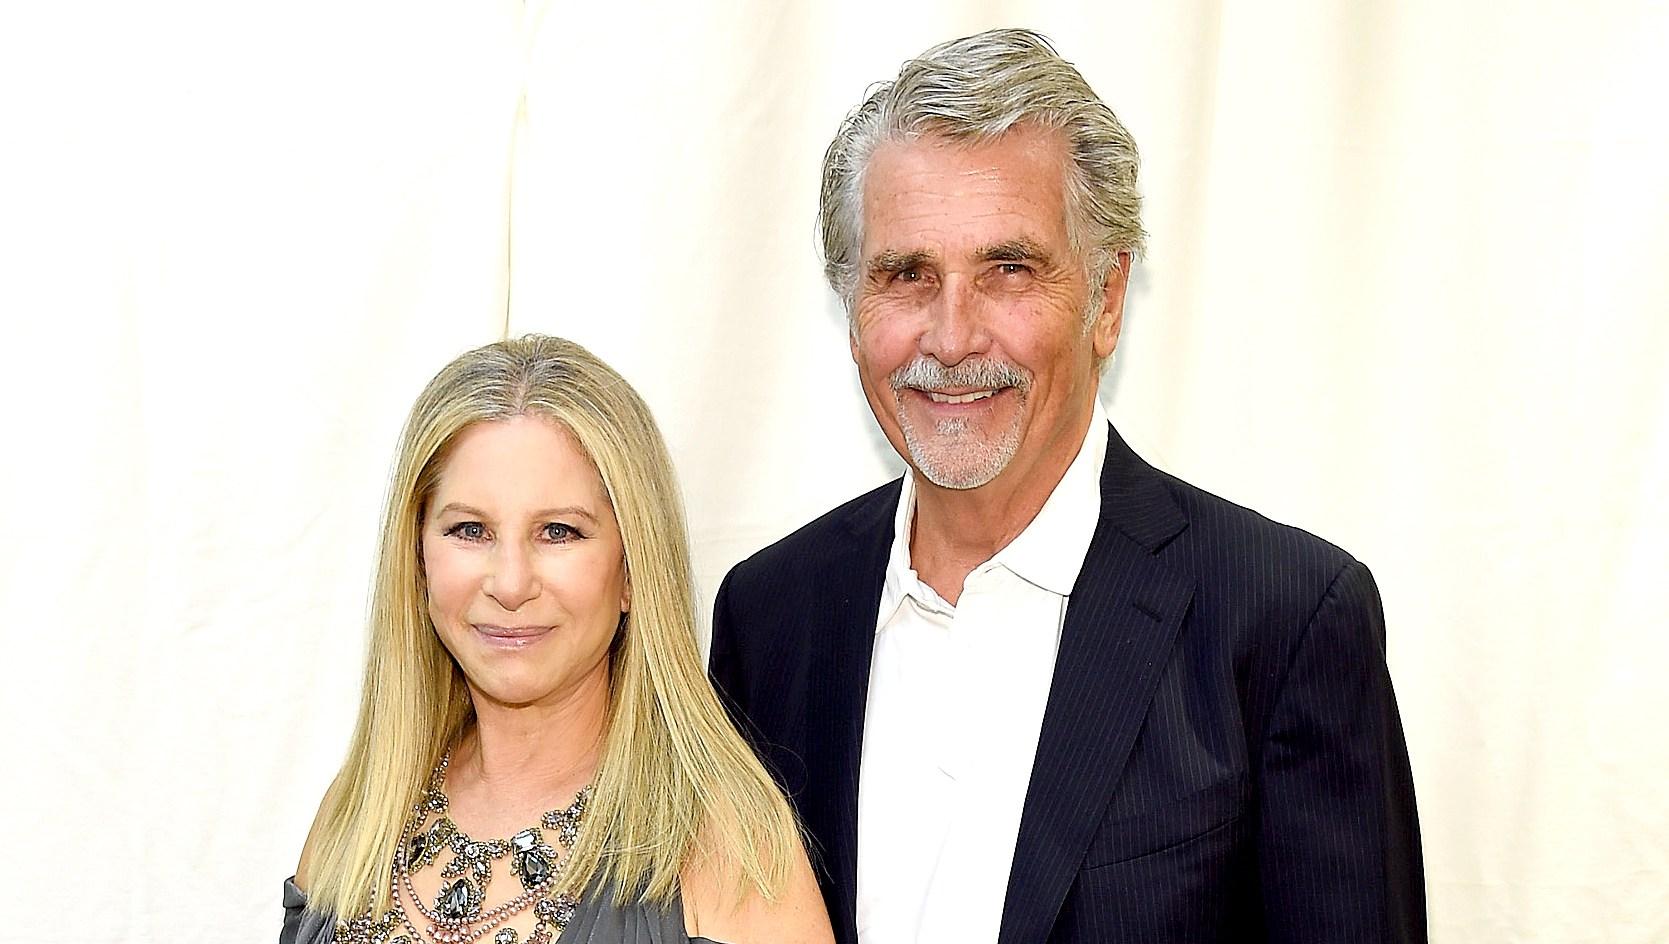 Barbra Streisand And James Brolin Celebrate 20th Anniversary